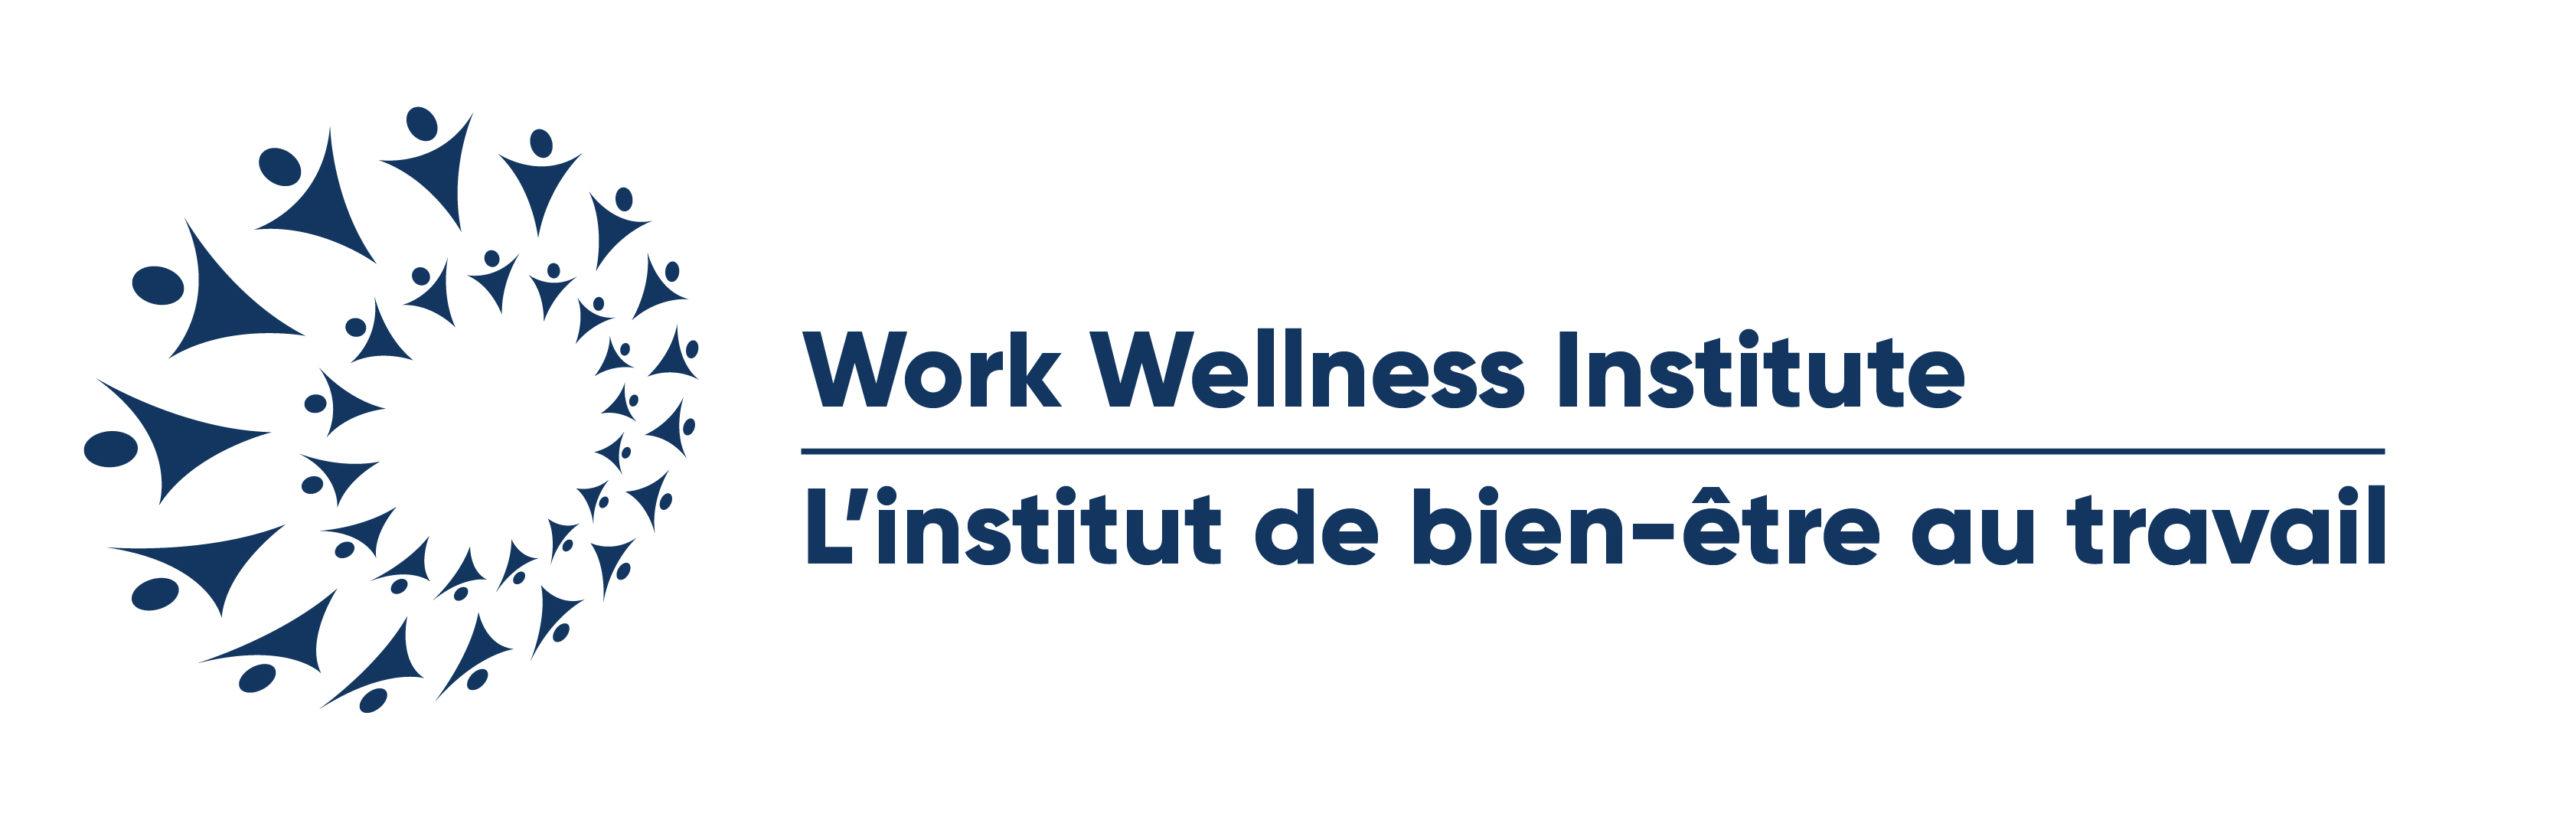 Work Wellness Institute